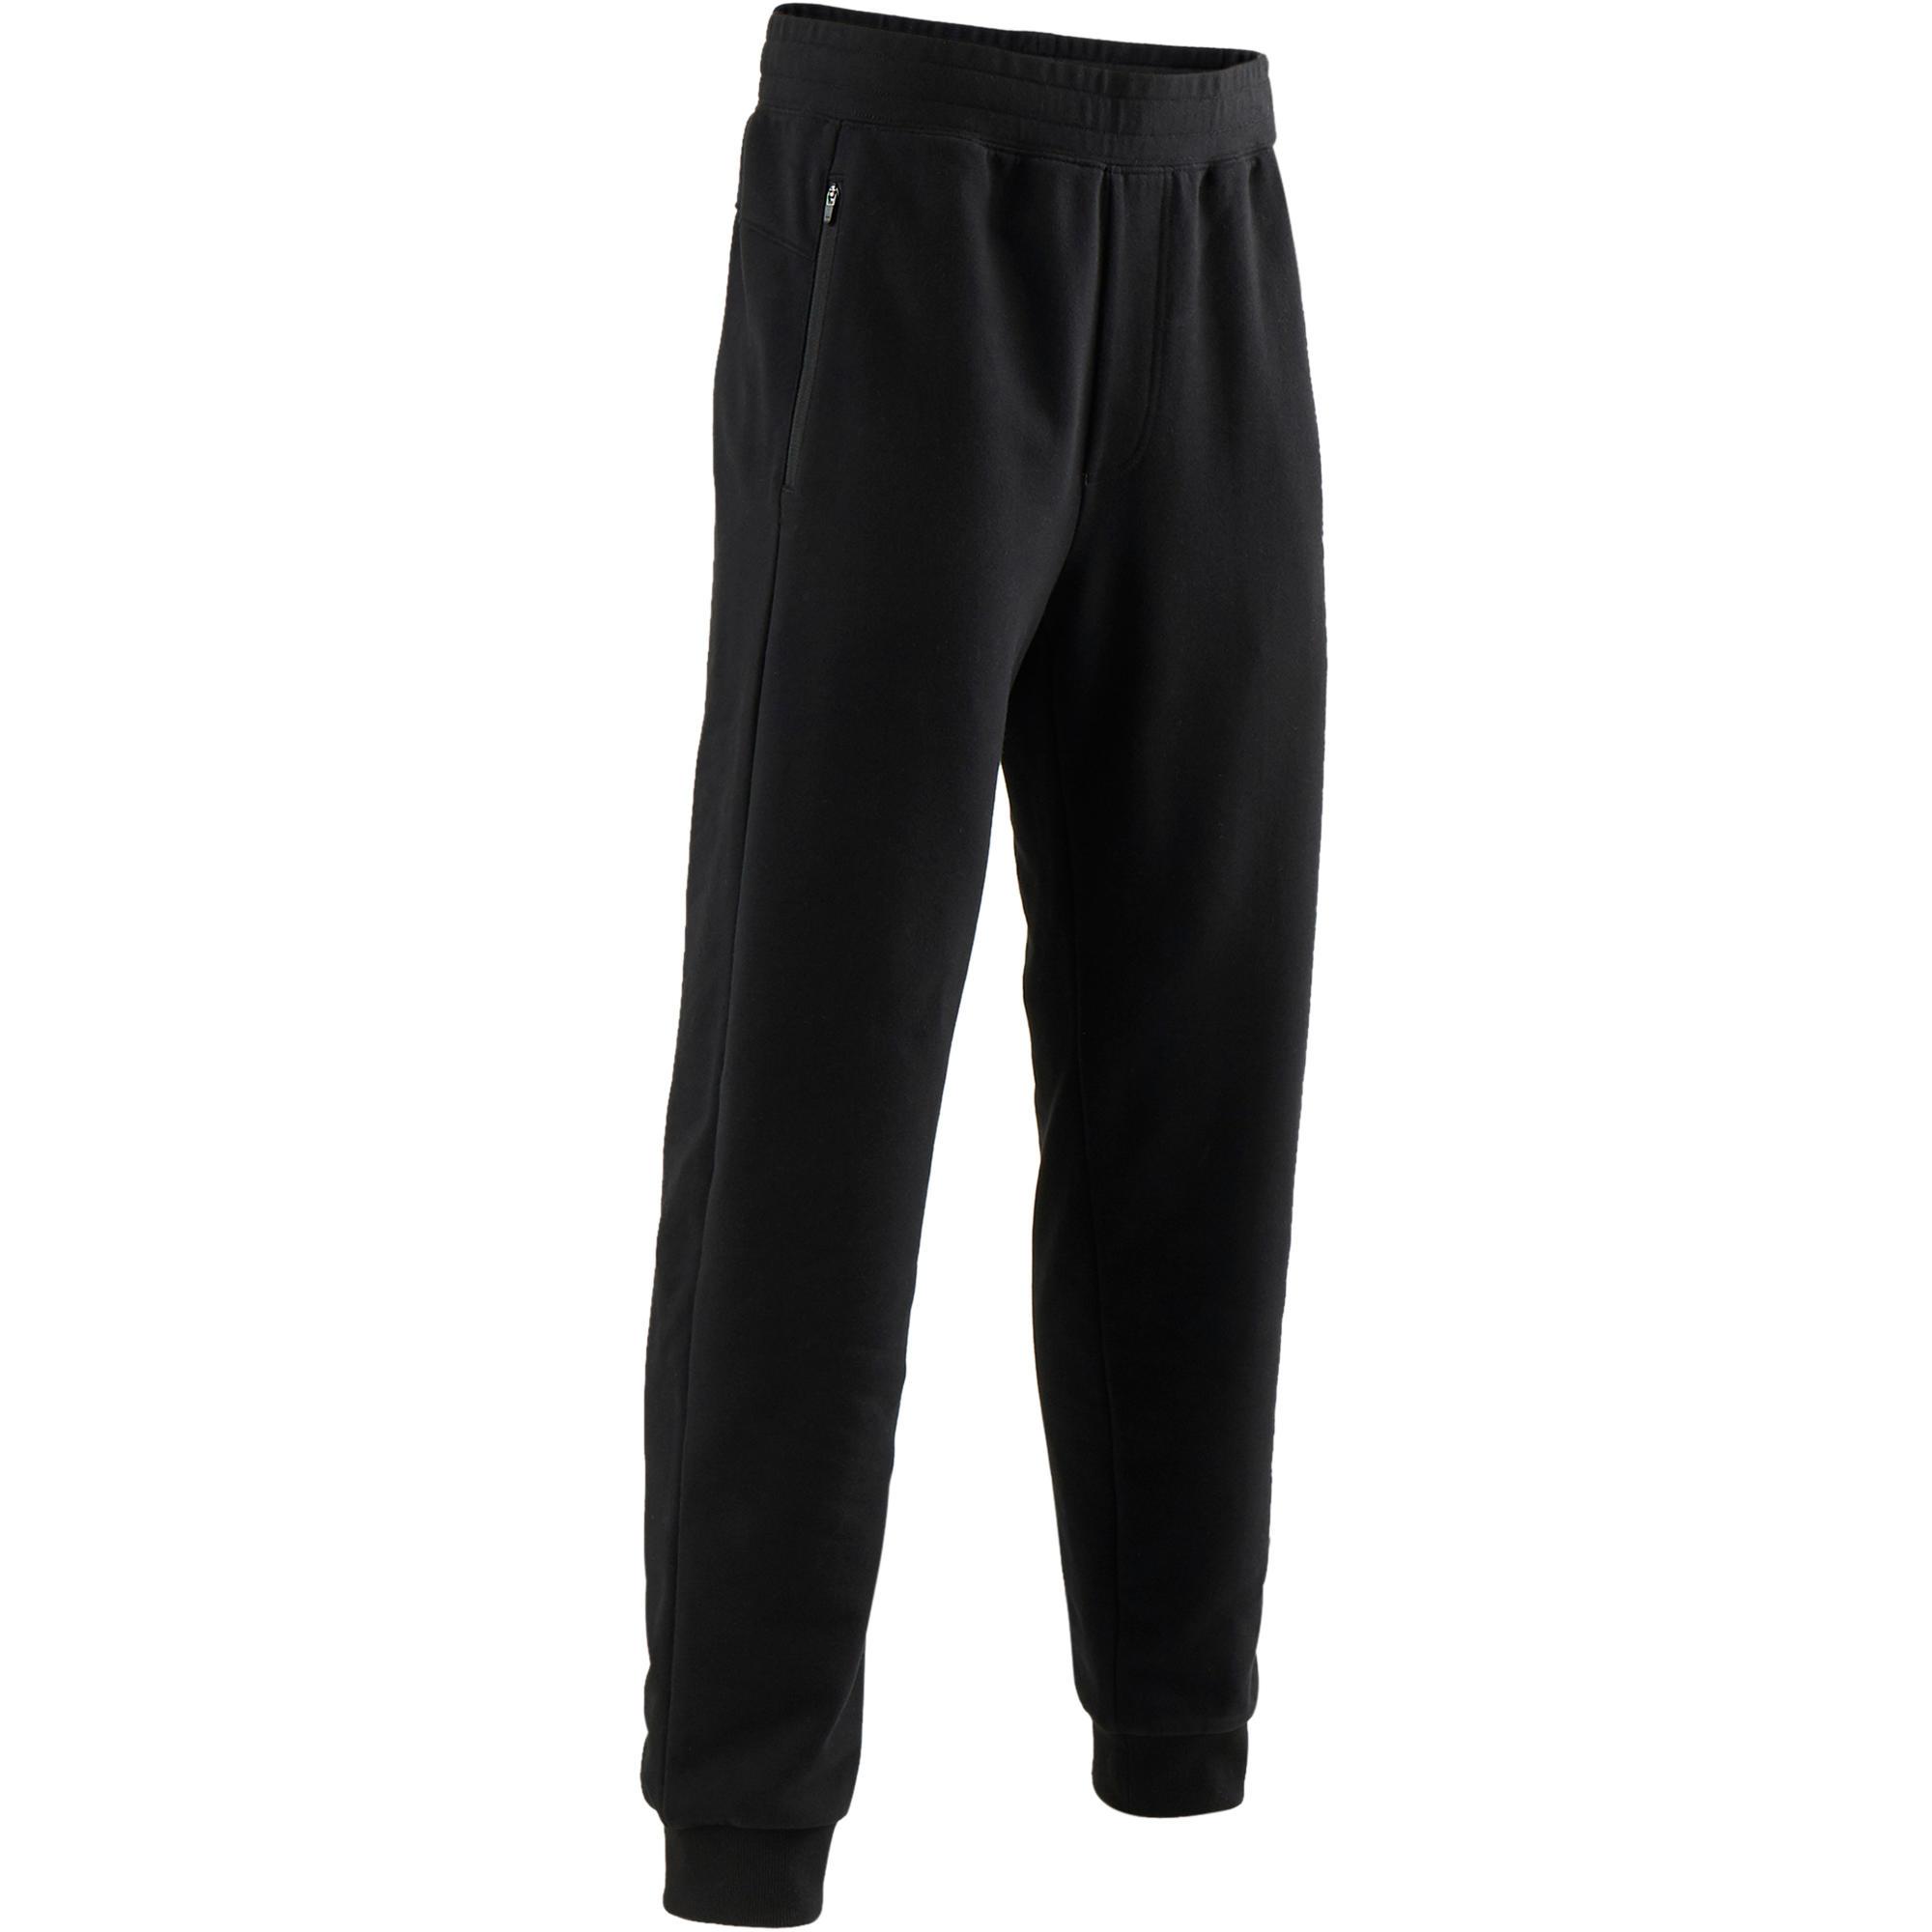 Pantalón 500 regular cremallera Pilates y Gimnasia suave negro hombre